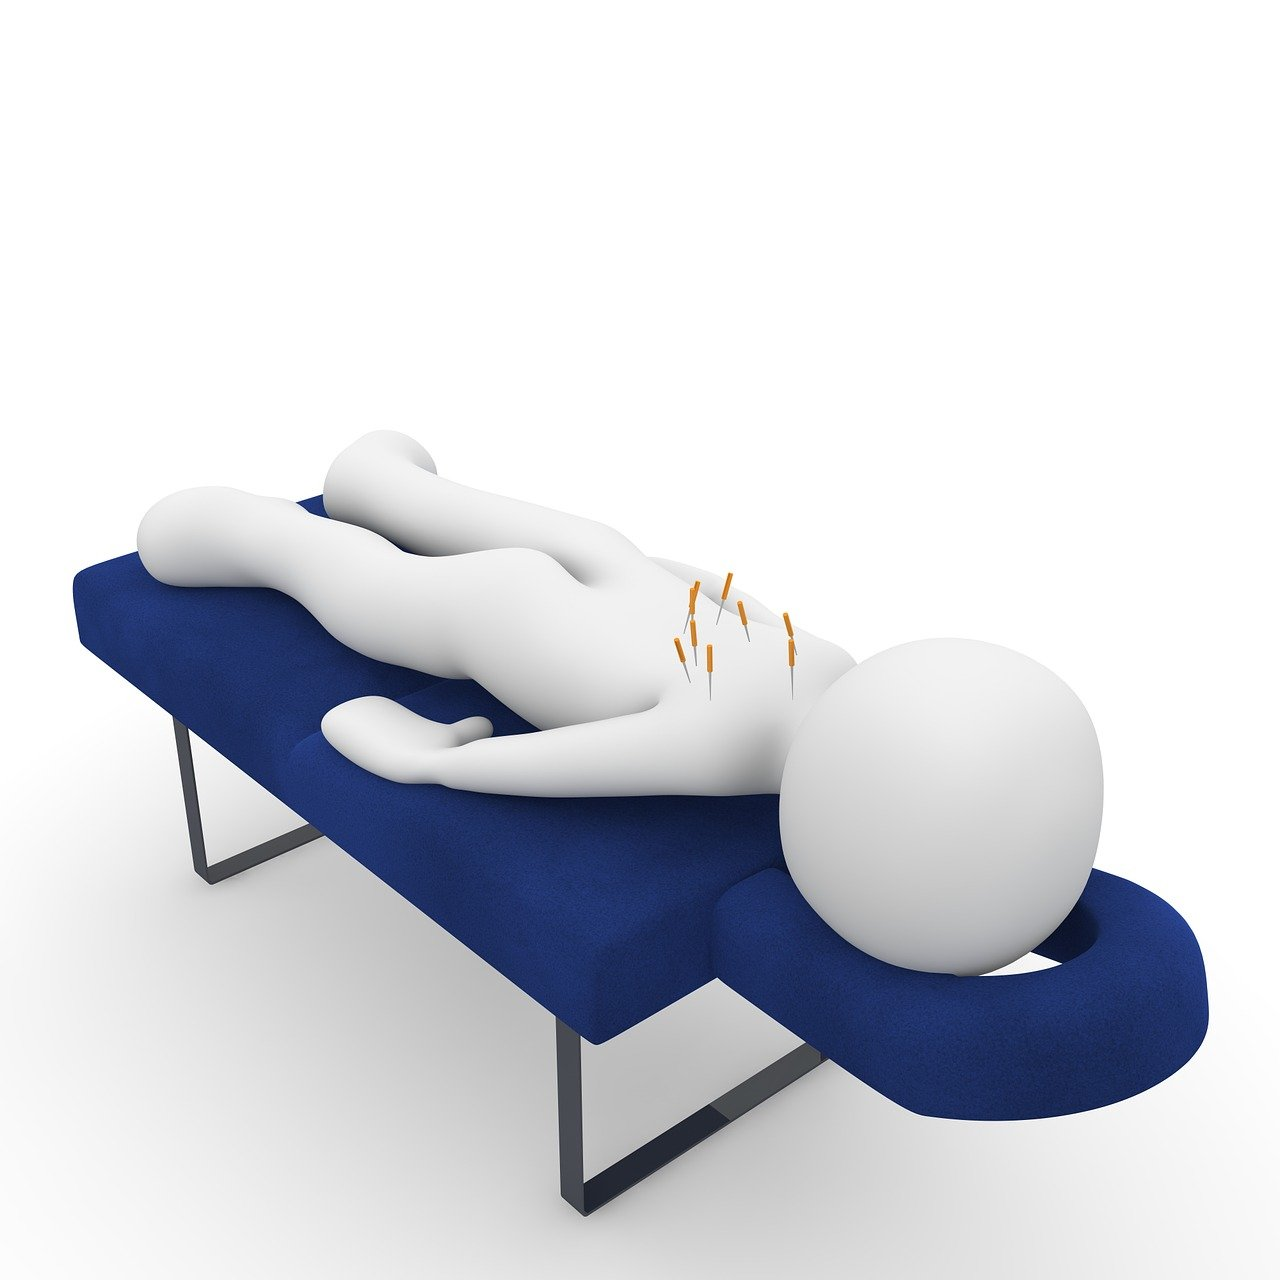 Paramedisch Instituut Rembrandt fysiotherapeut